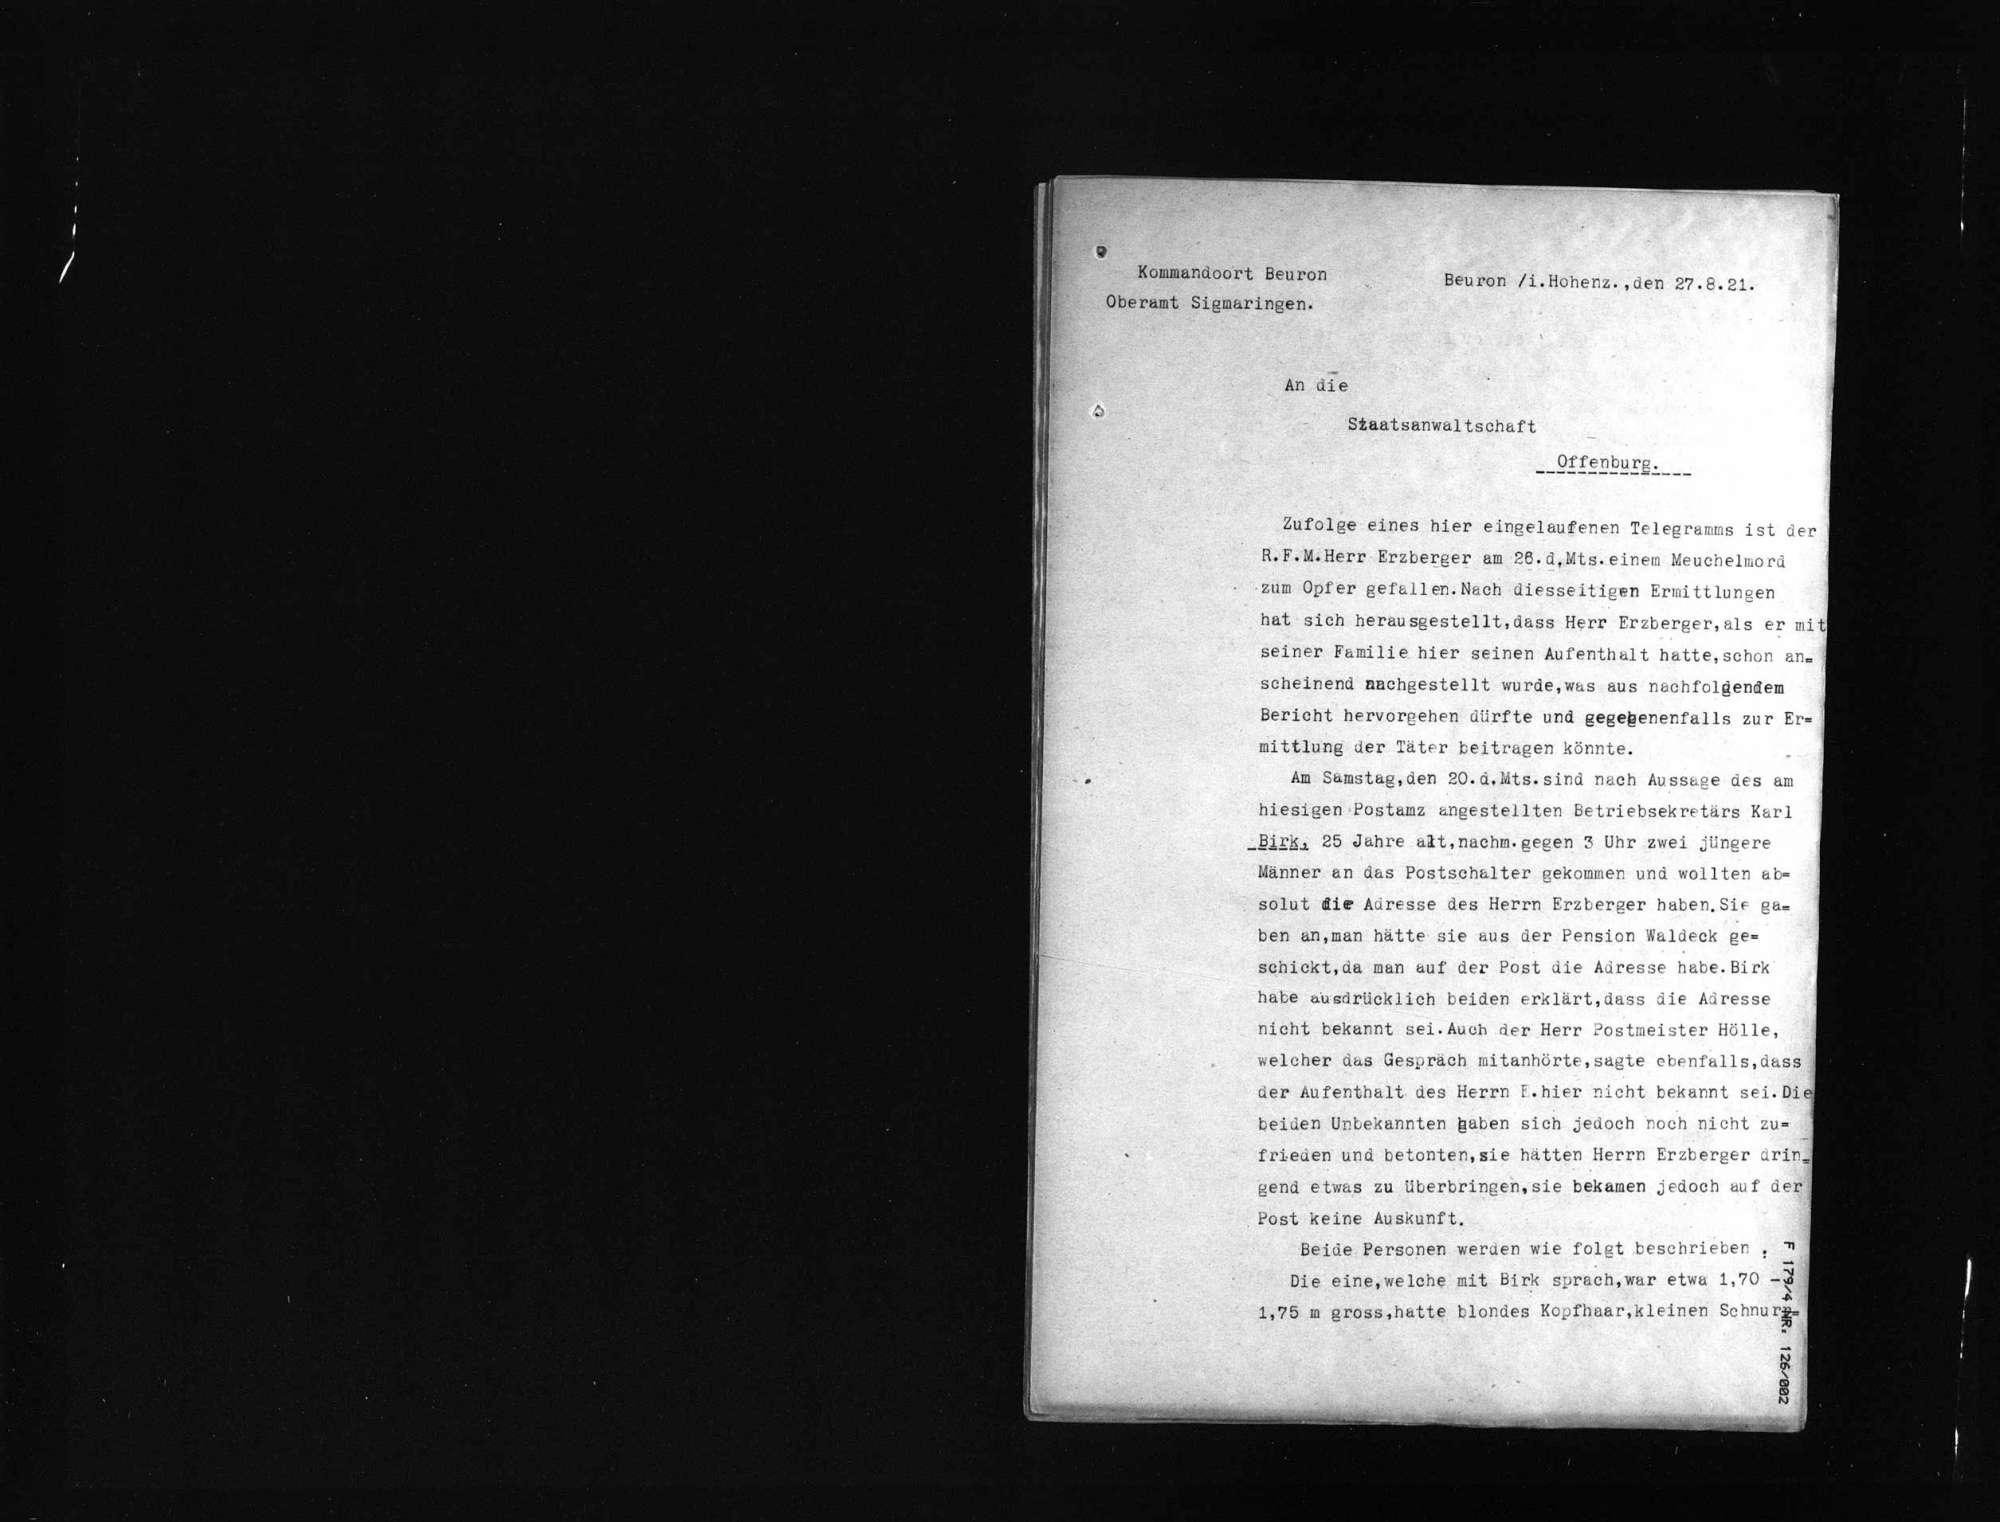 Untersuchungsakten -Sonderheft Beuron (beglaubigte Abschrift), Bild 2